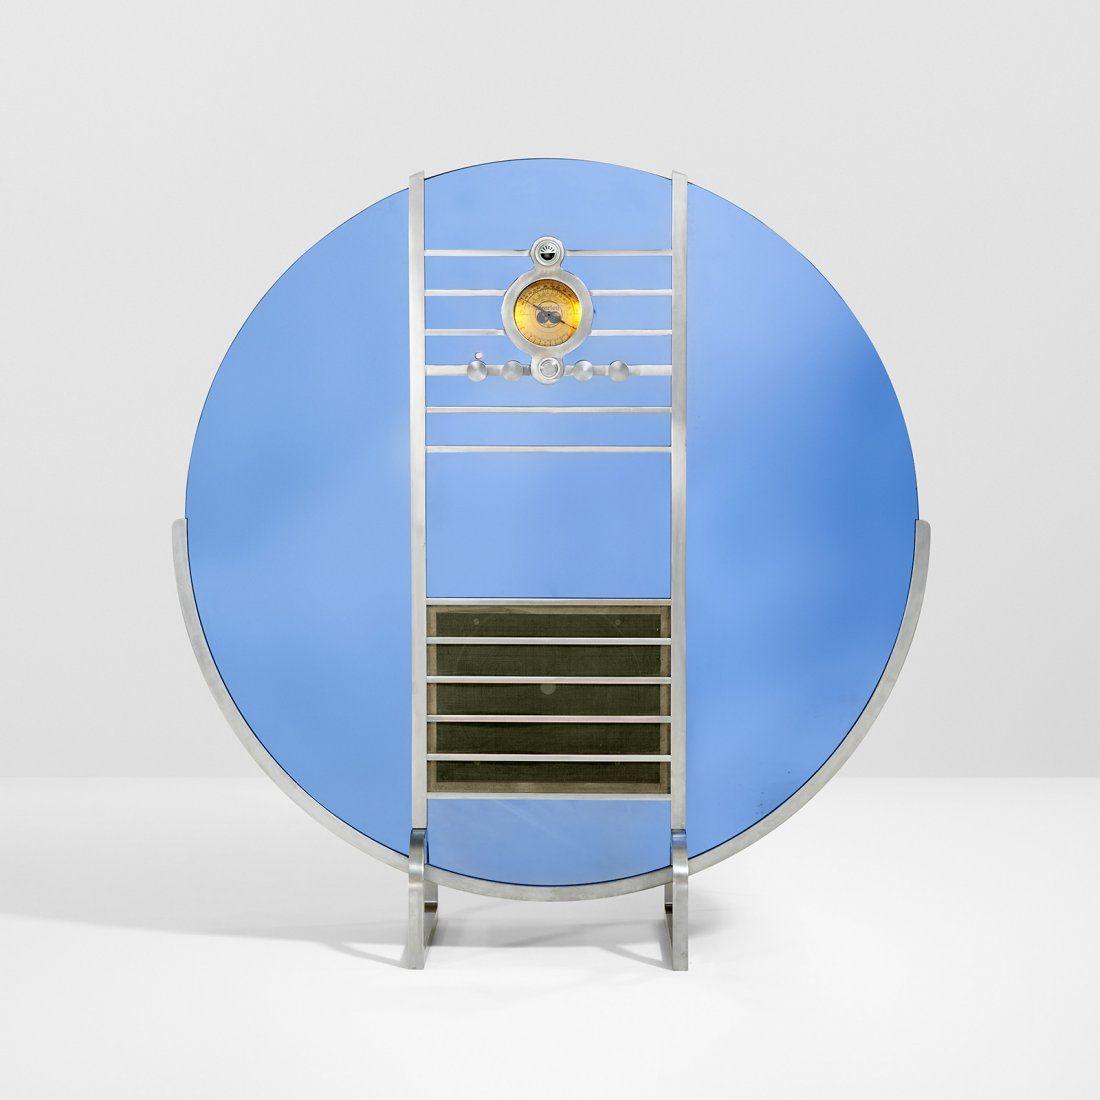 Walter Dorwin Teague Nocturne radio, model 1186